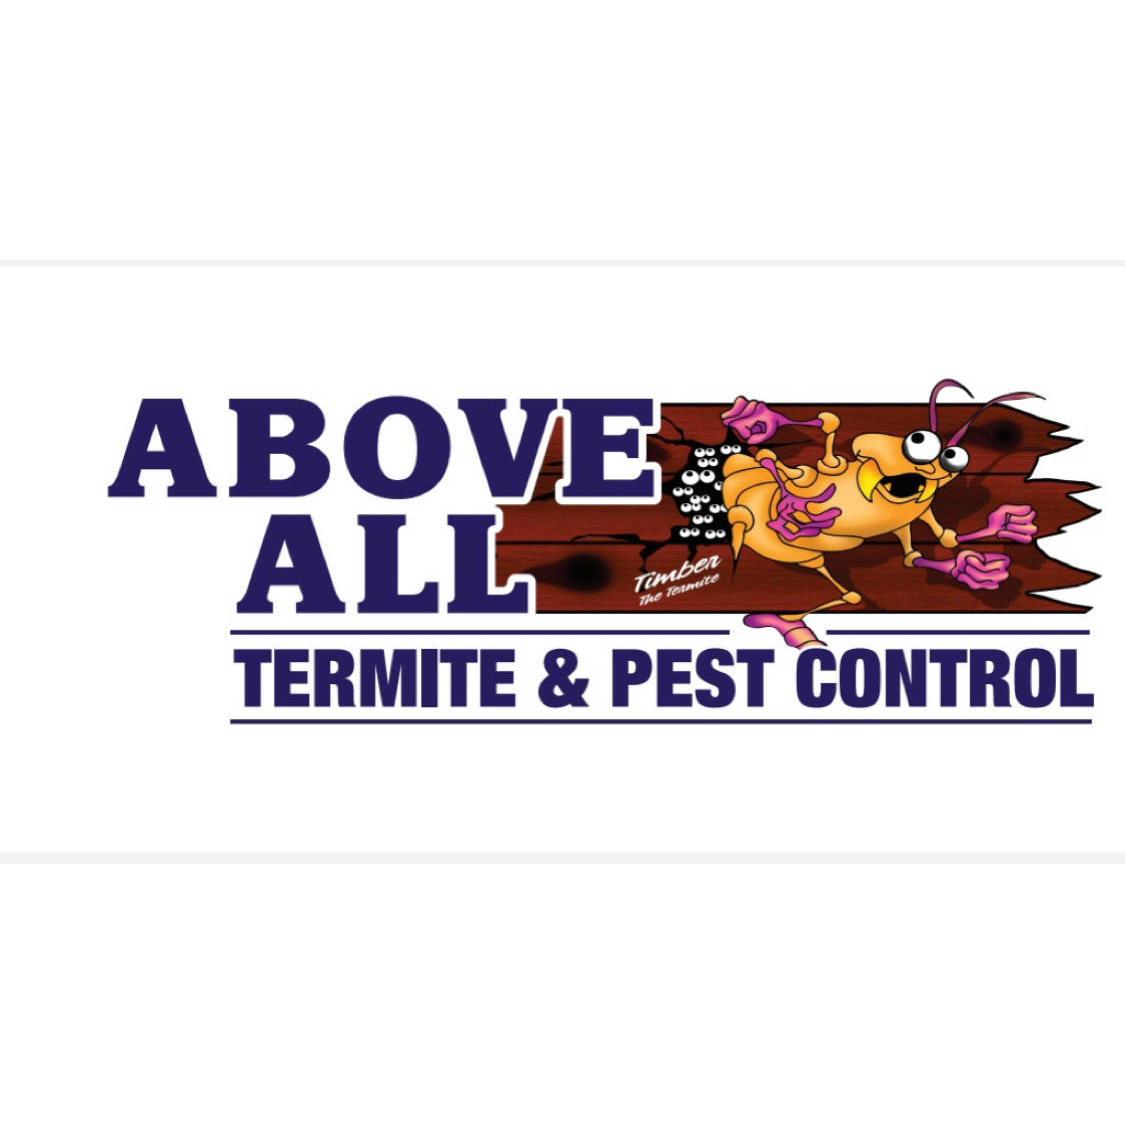 Above All Termite & Pest Control image 5